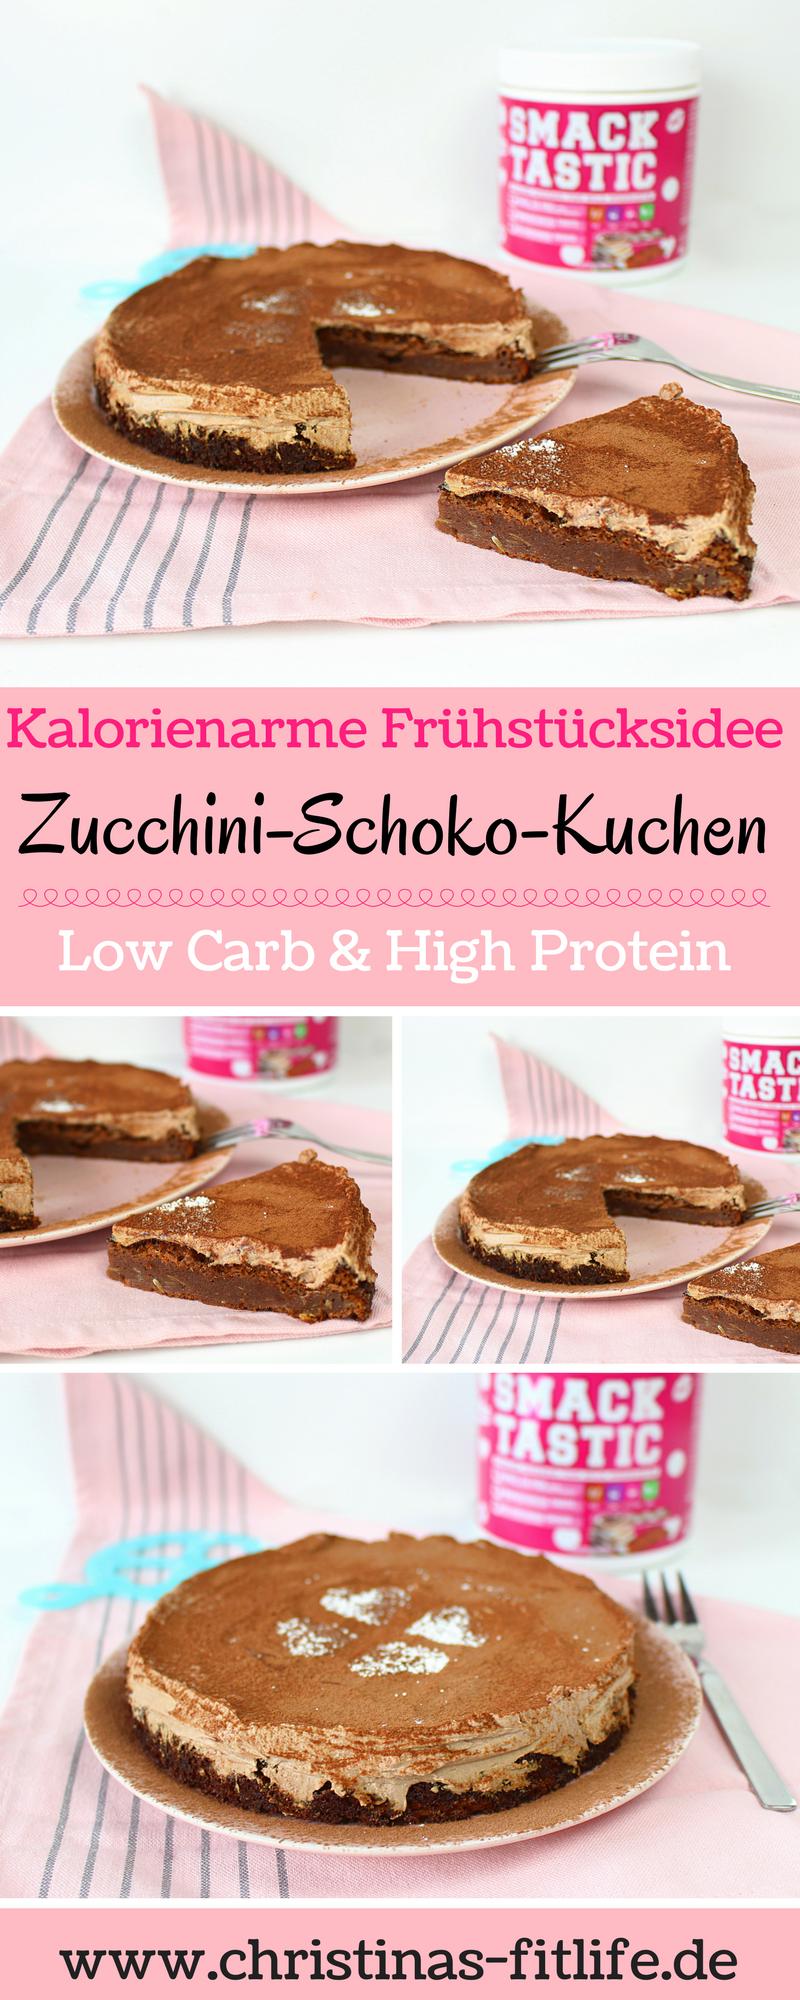 ᐅ Zucchini Schoko Kuchen ᐅ Low Carb High Protein Low Carb High Protein Kuchen Gesunde Desserts